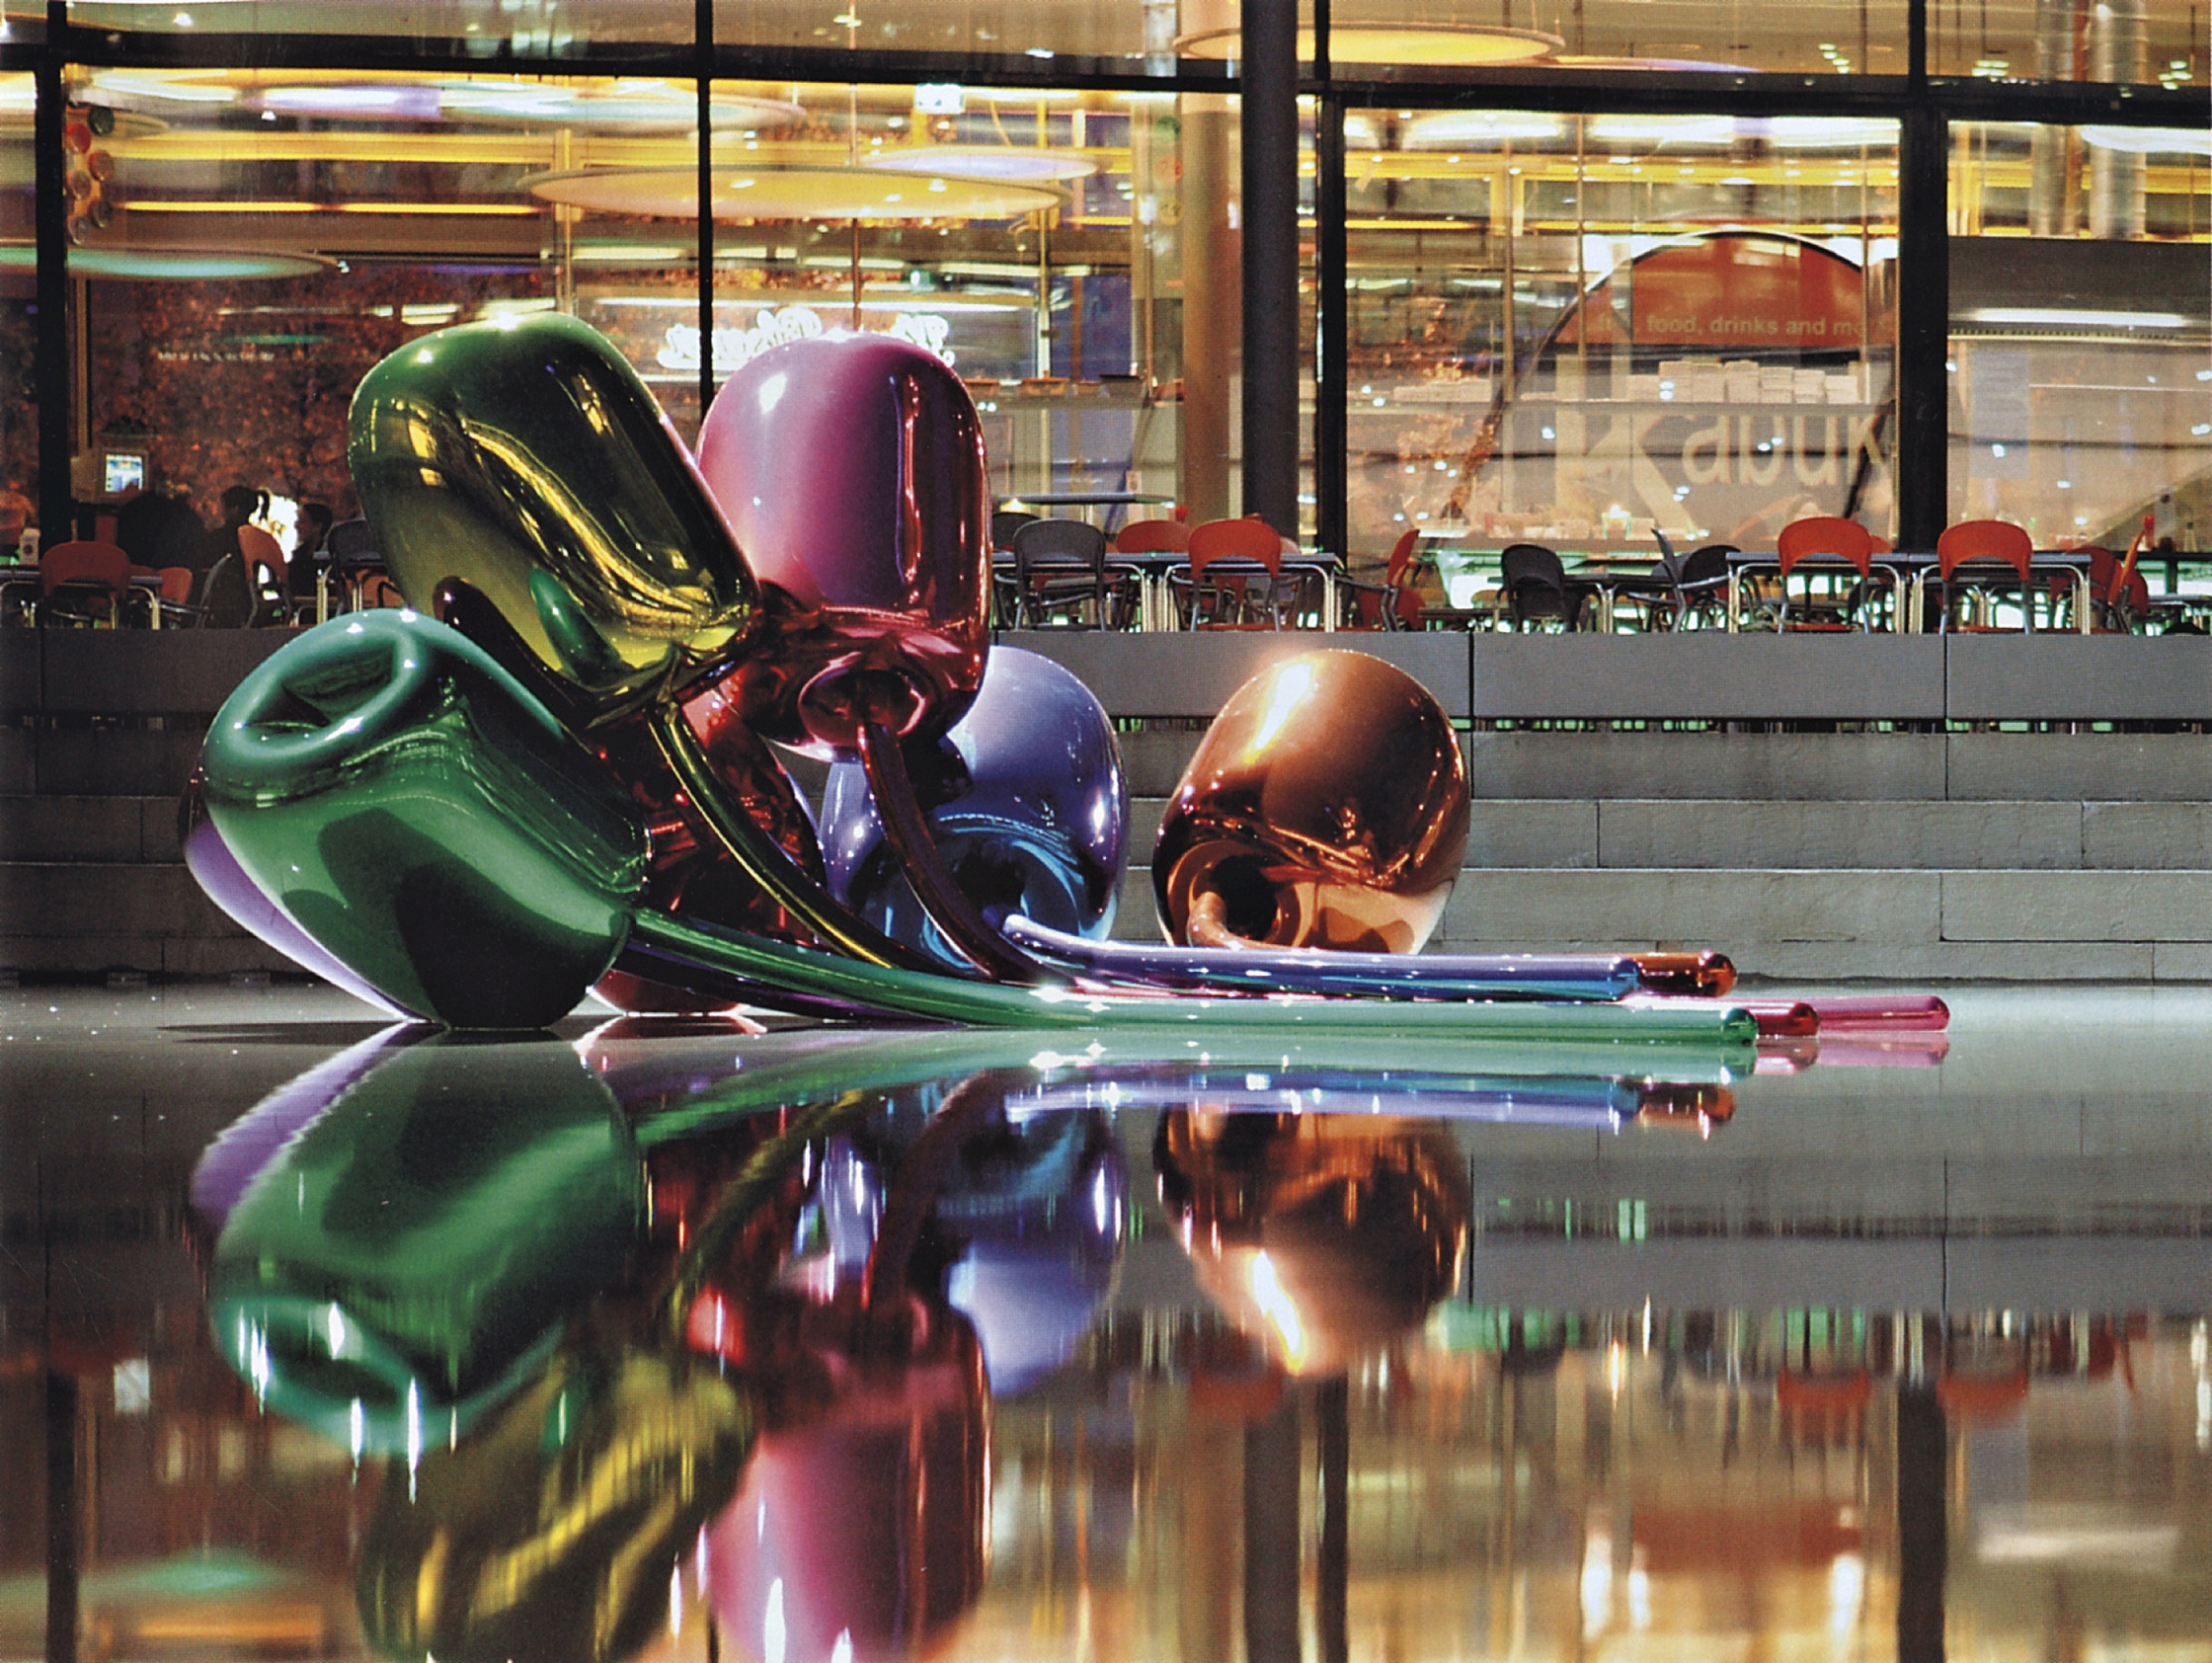 Джефф Кунс, скульптура, тюльпаны